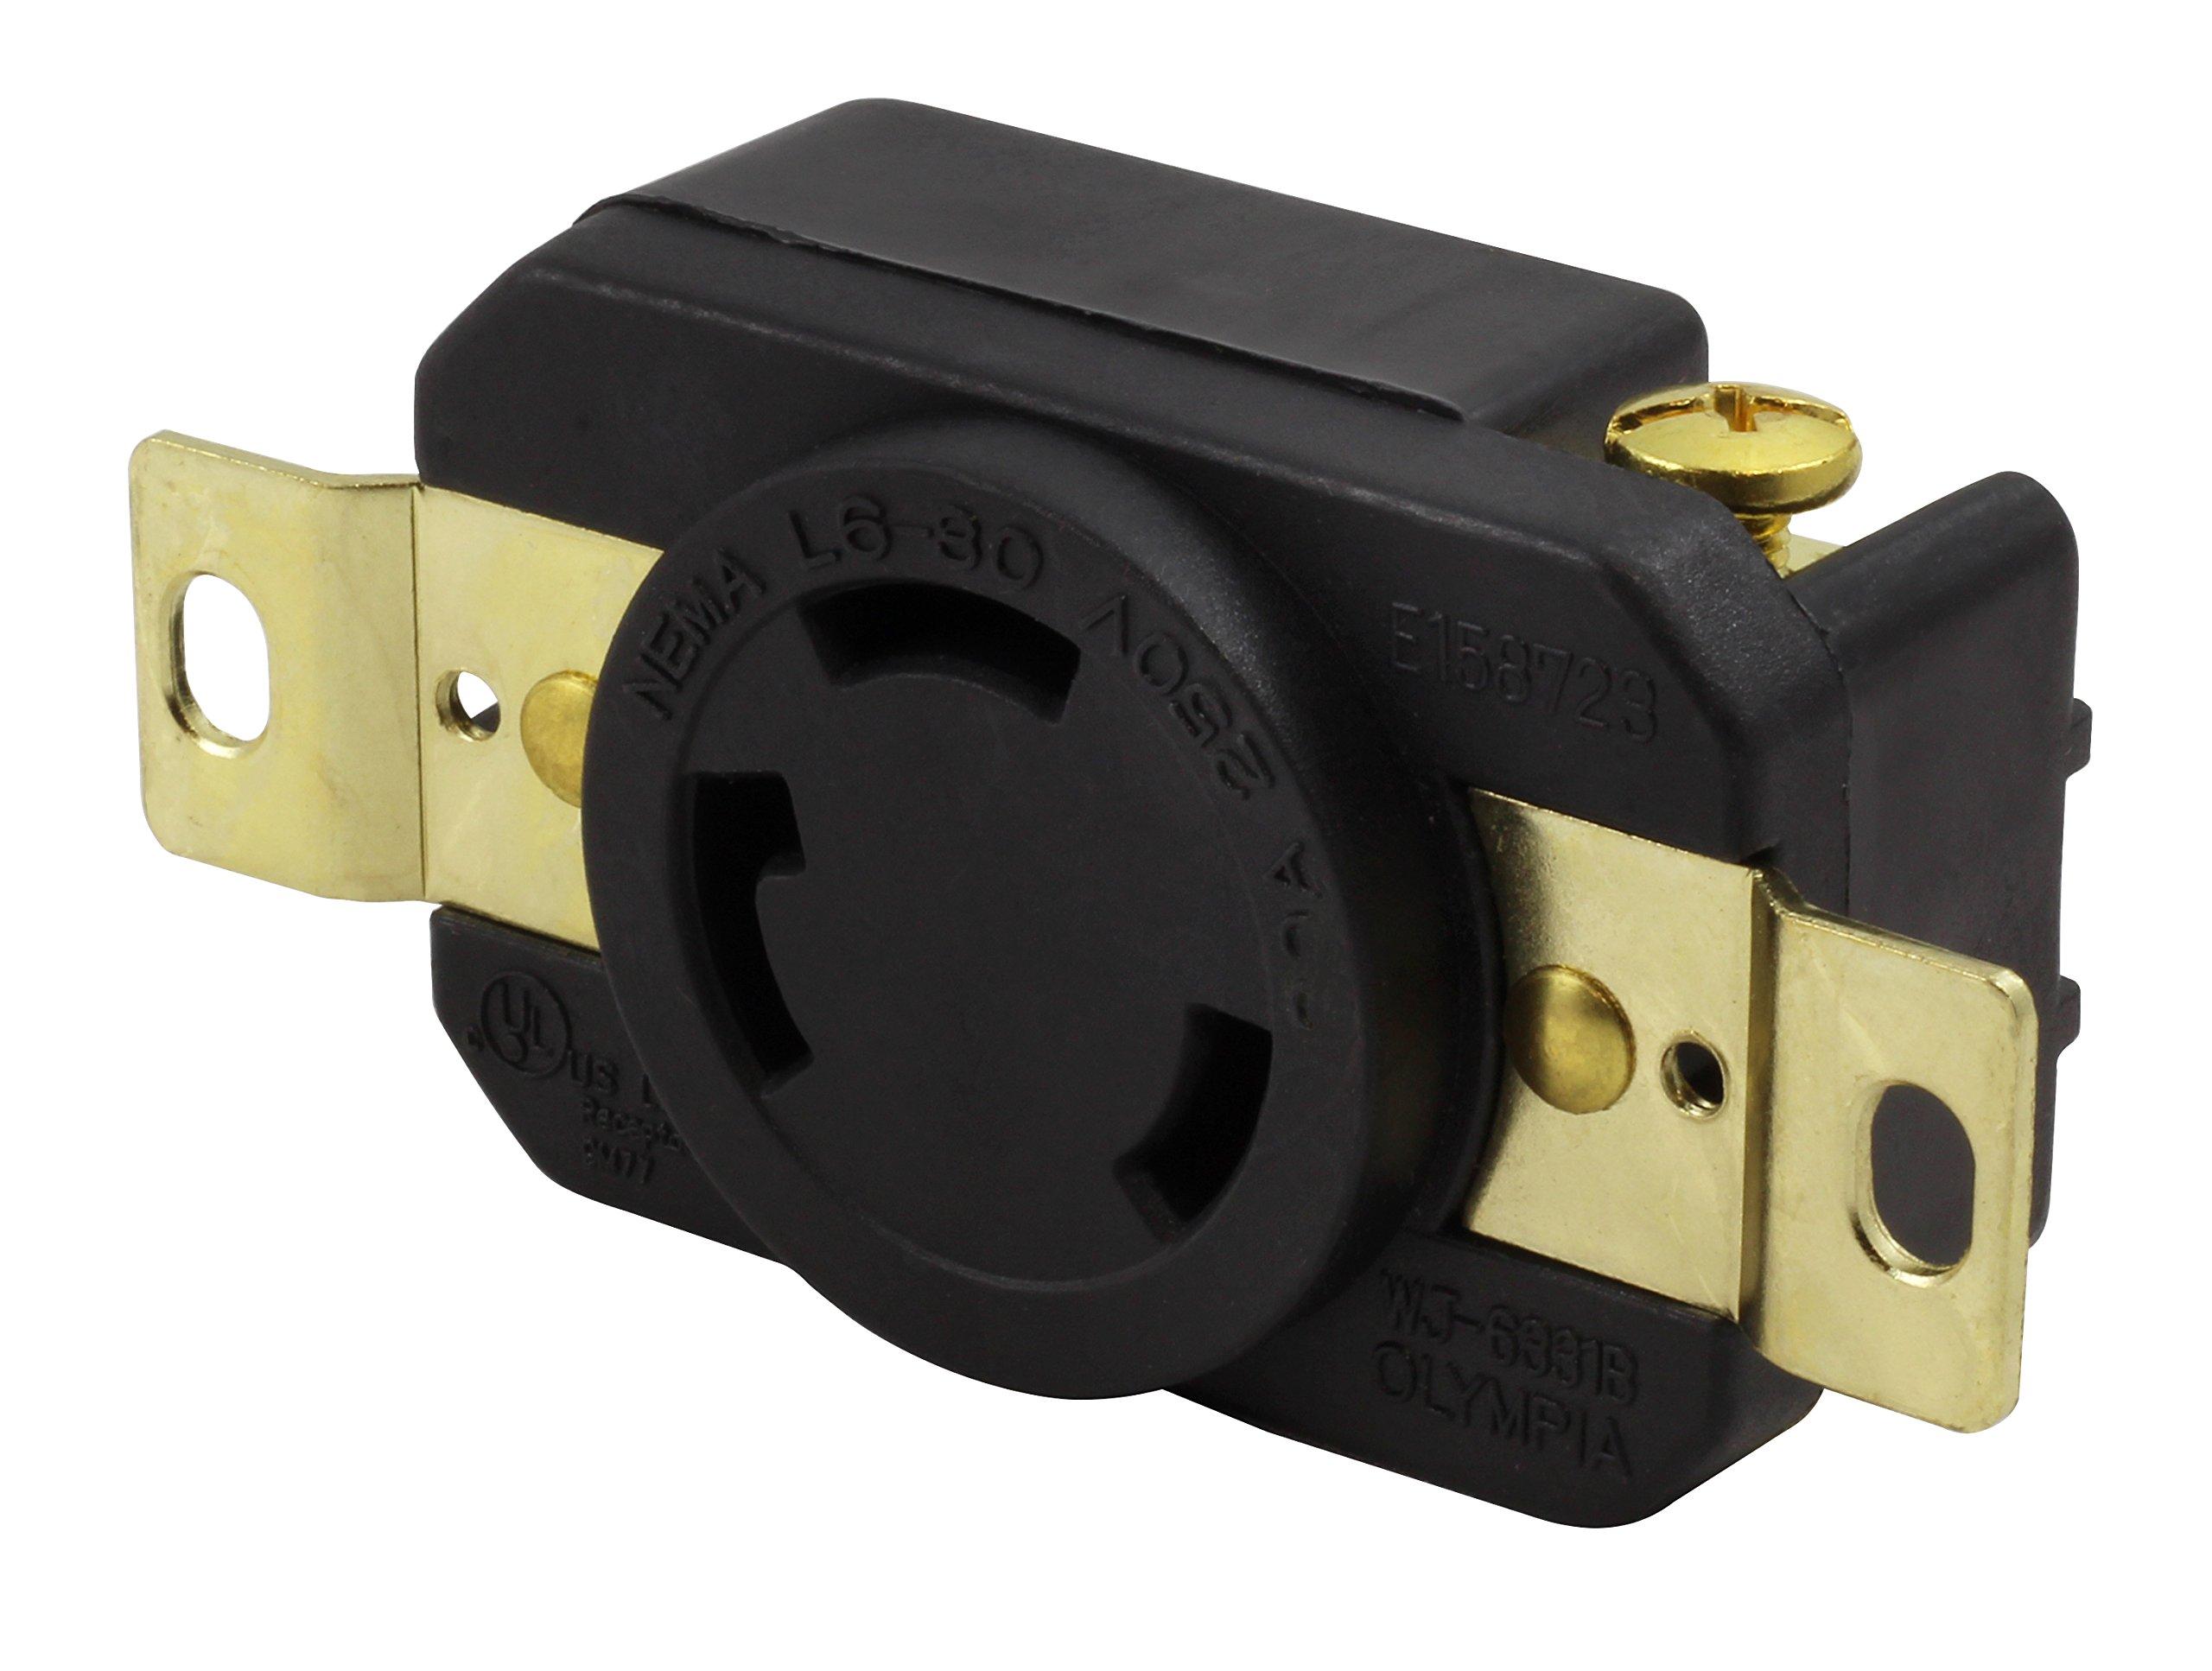 AC WORKS [FML630R] 30-Amp, 250-Volt, NEMA L6-30R Flush Mounting Locking Industrial Grade Receptacle